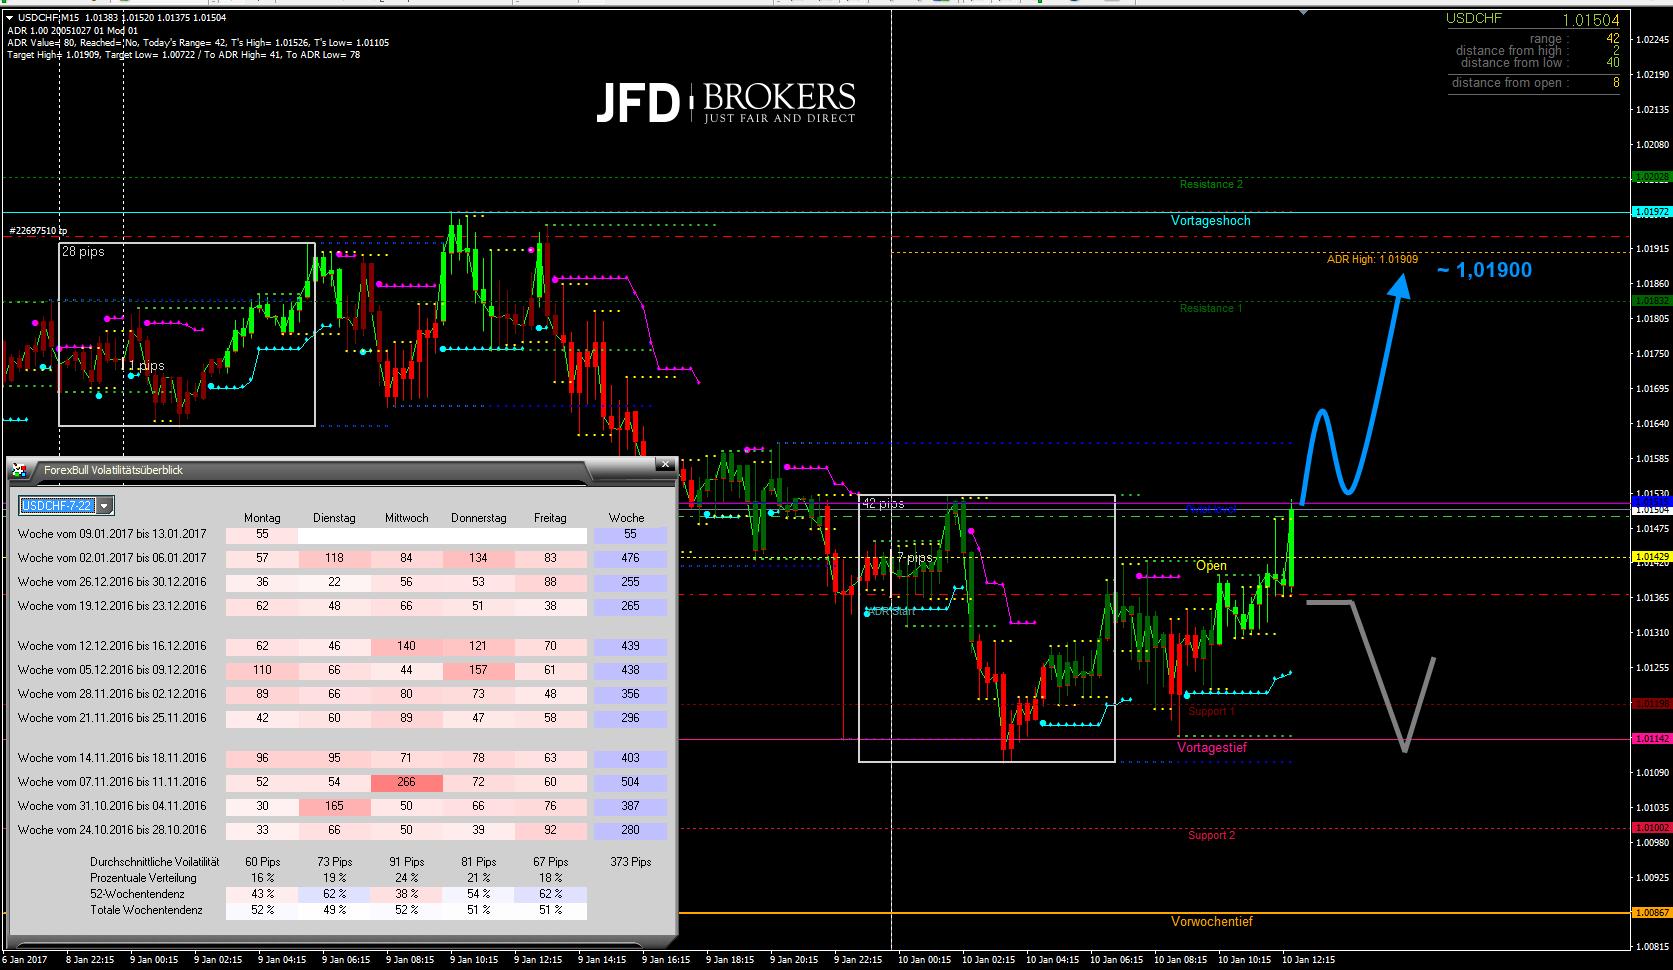 USD-CHF-M15-Oberhalb-des-Pivot-Points-wird-es-spannend-Kommentar-JFD-Brokers-GodmodeTrader.de-1